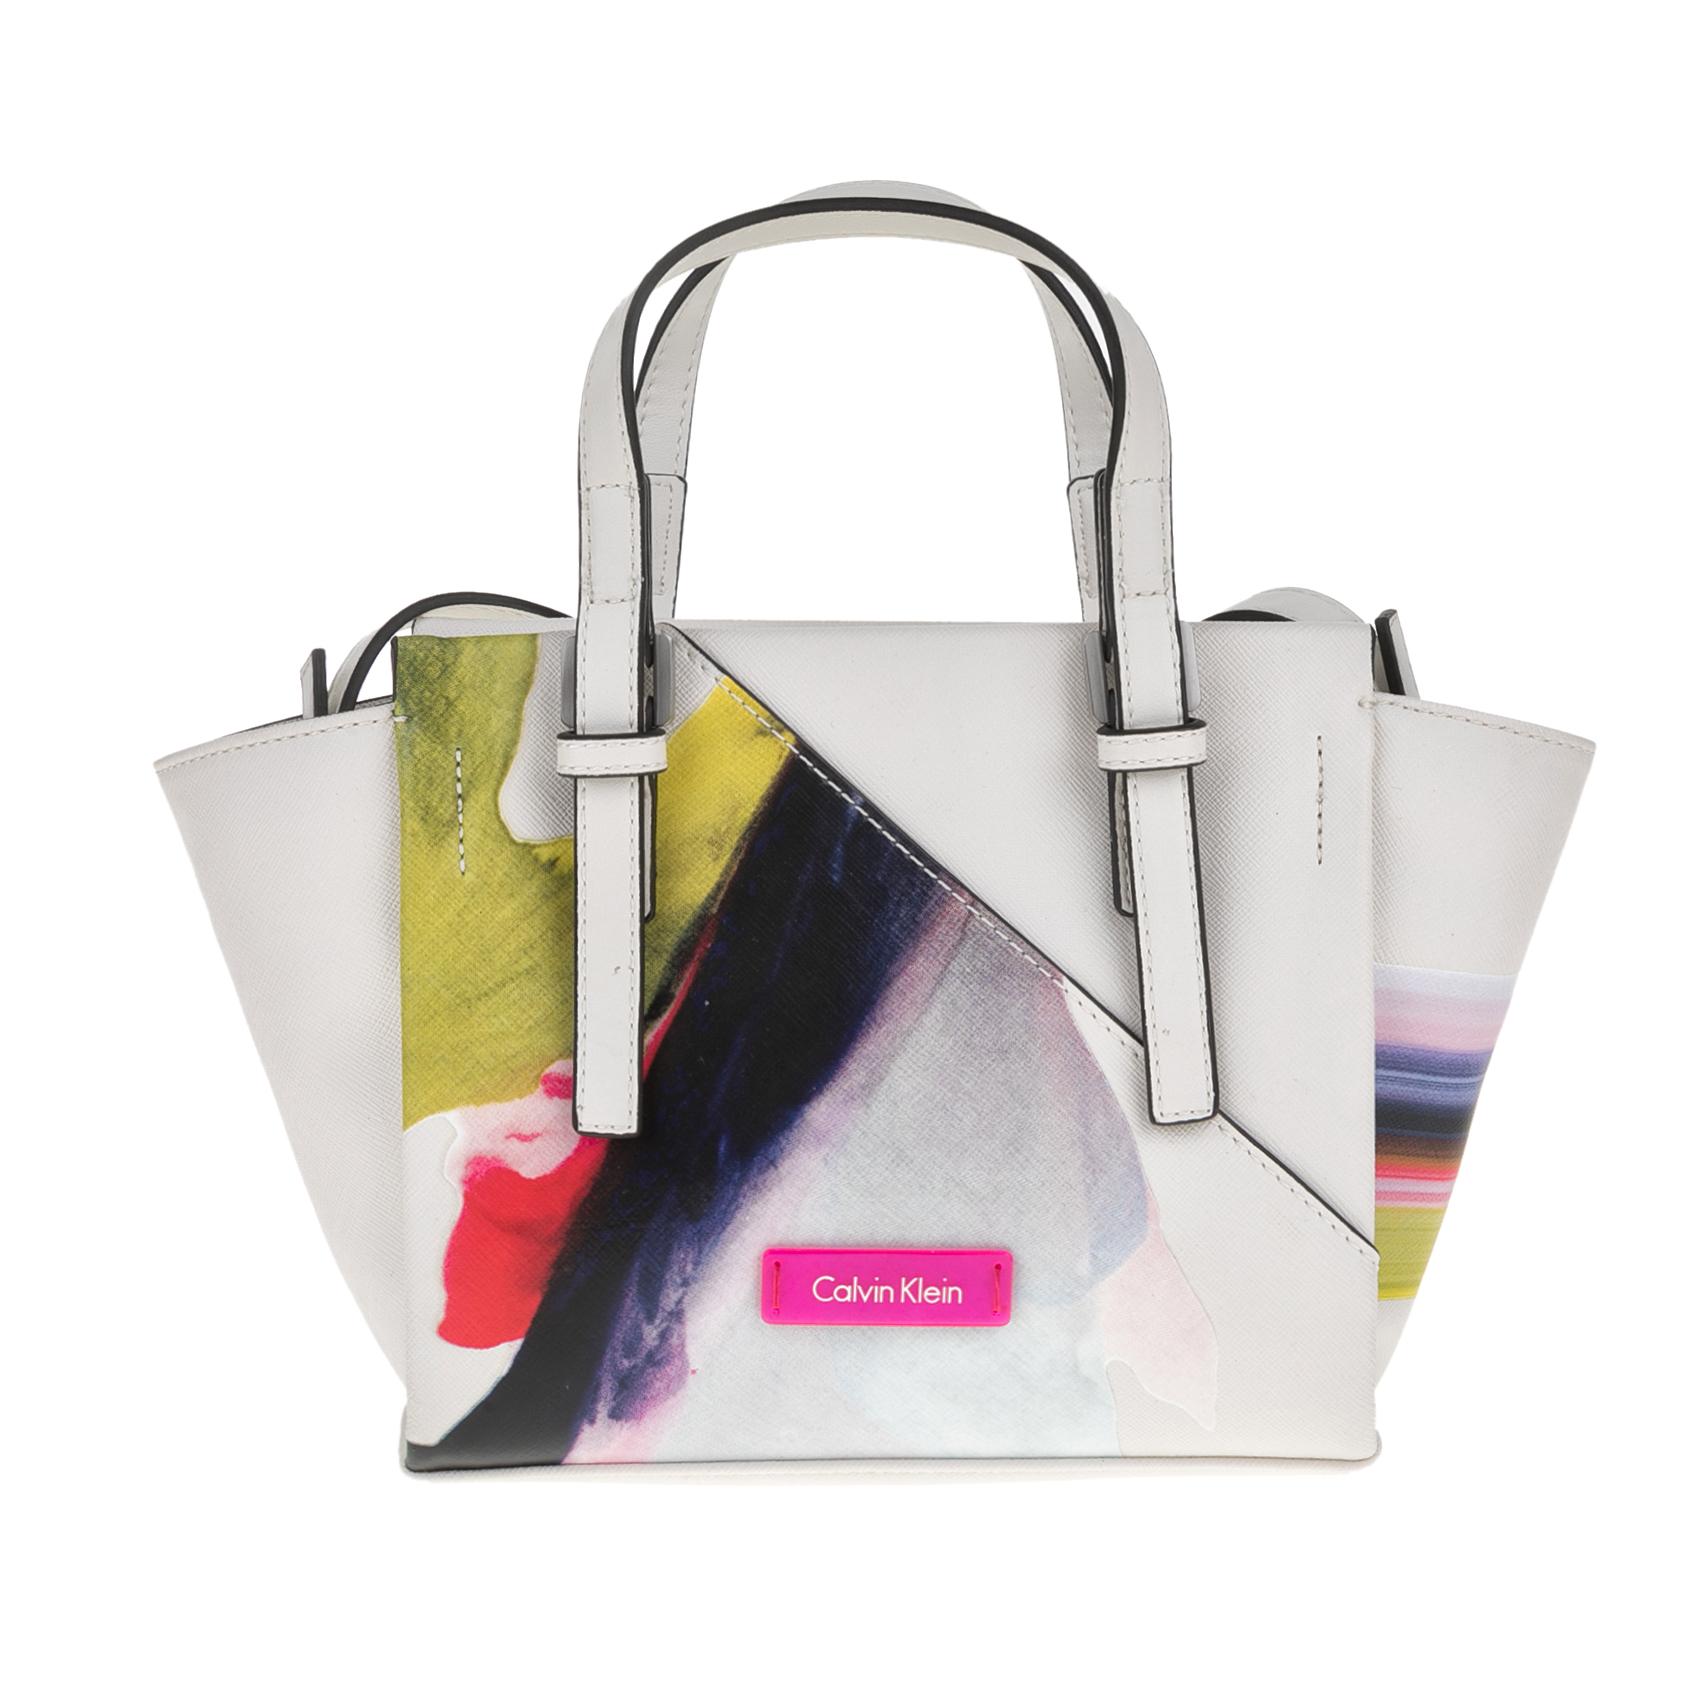 CALVIN KLEIN JEANS – Γυναικεία τσάντα CALVIN KLEIN JEANS M4RISSA PRINT MINI λευκή με μοτίβο